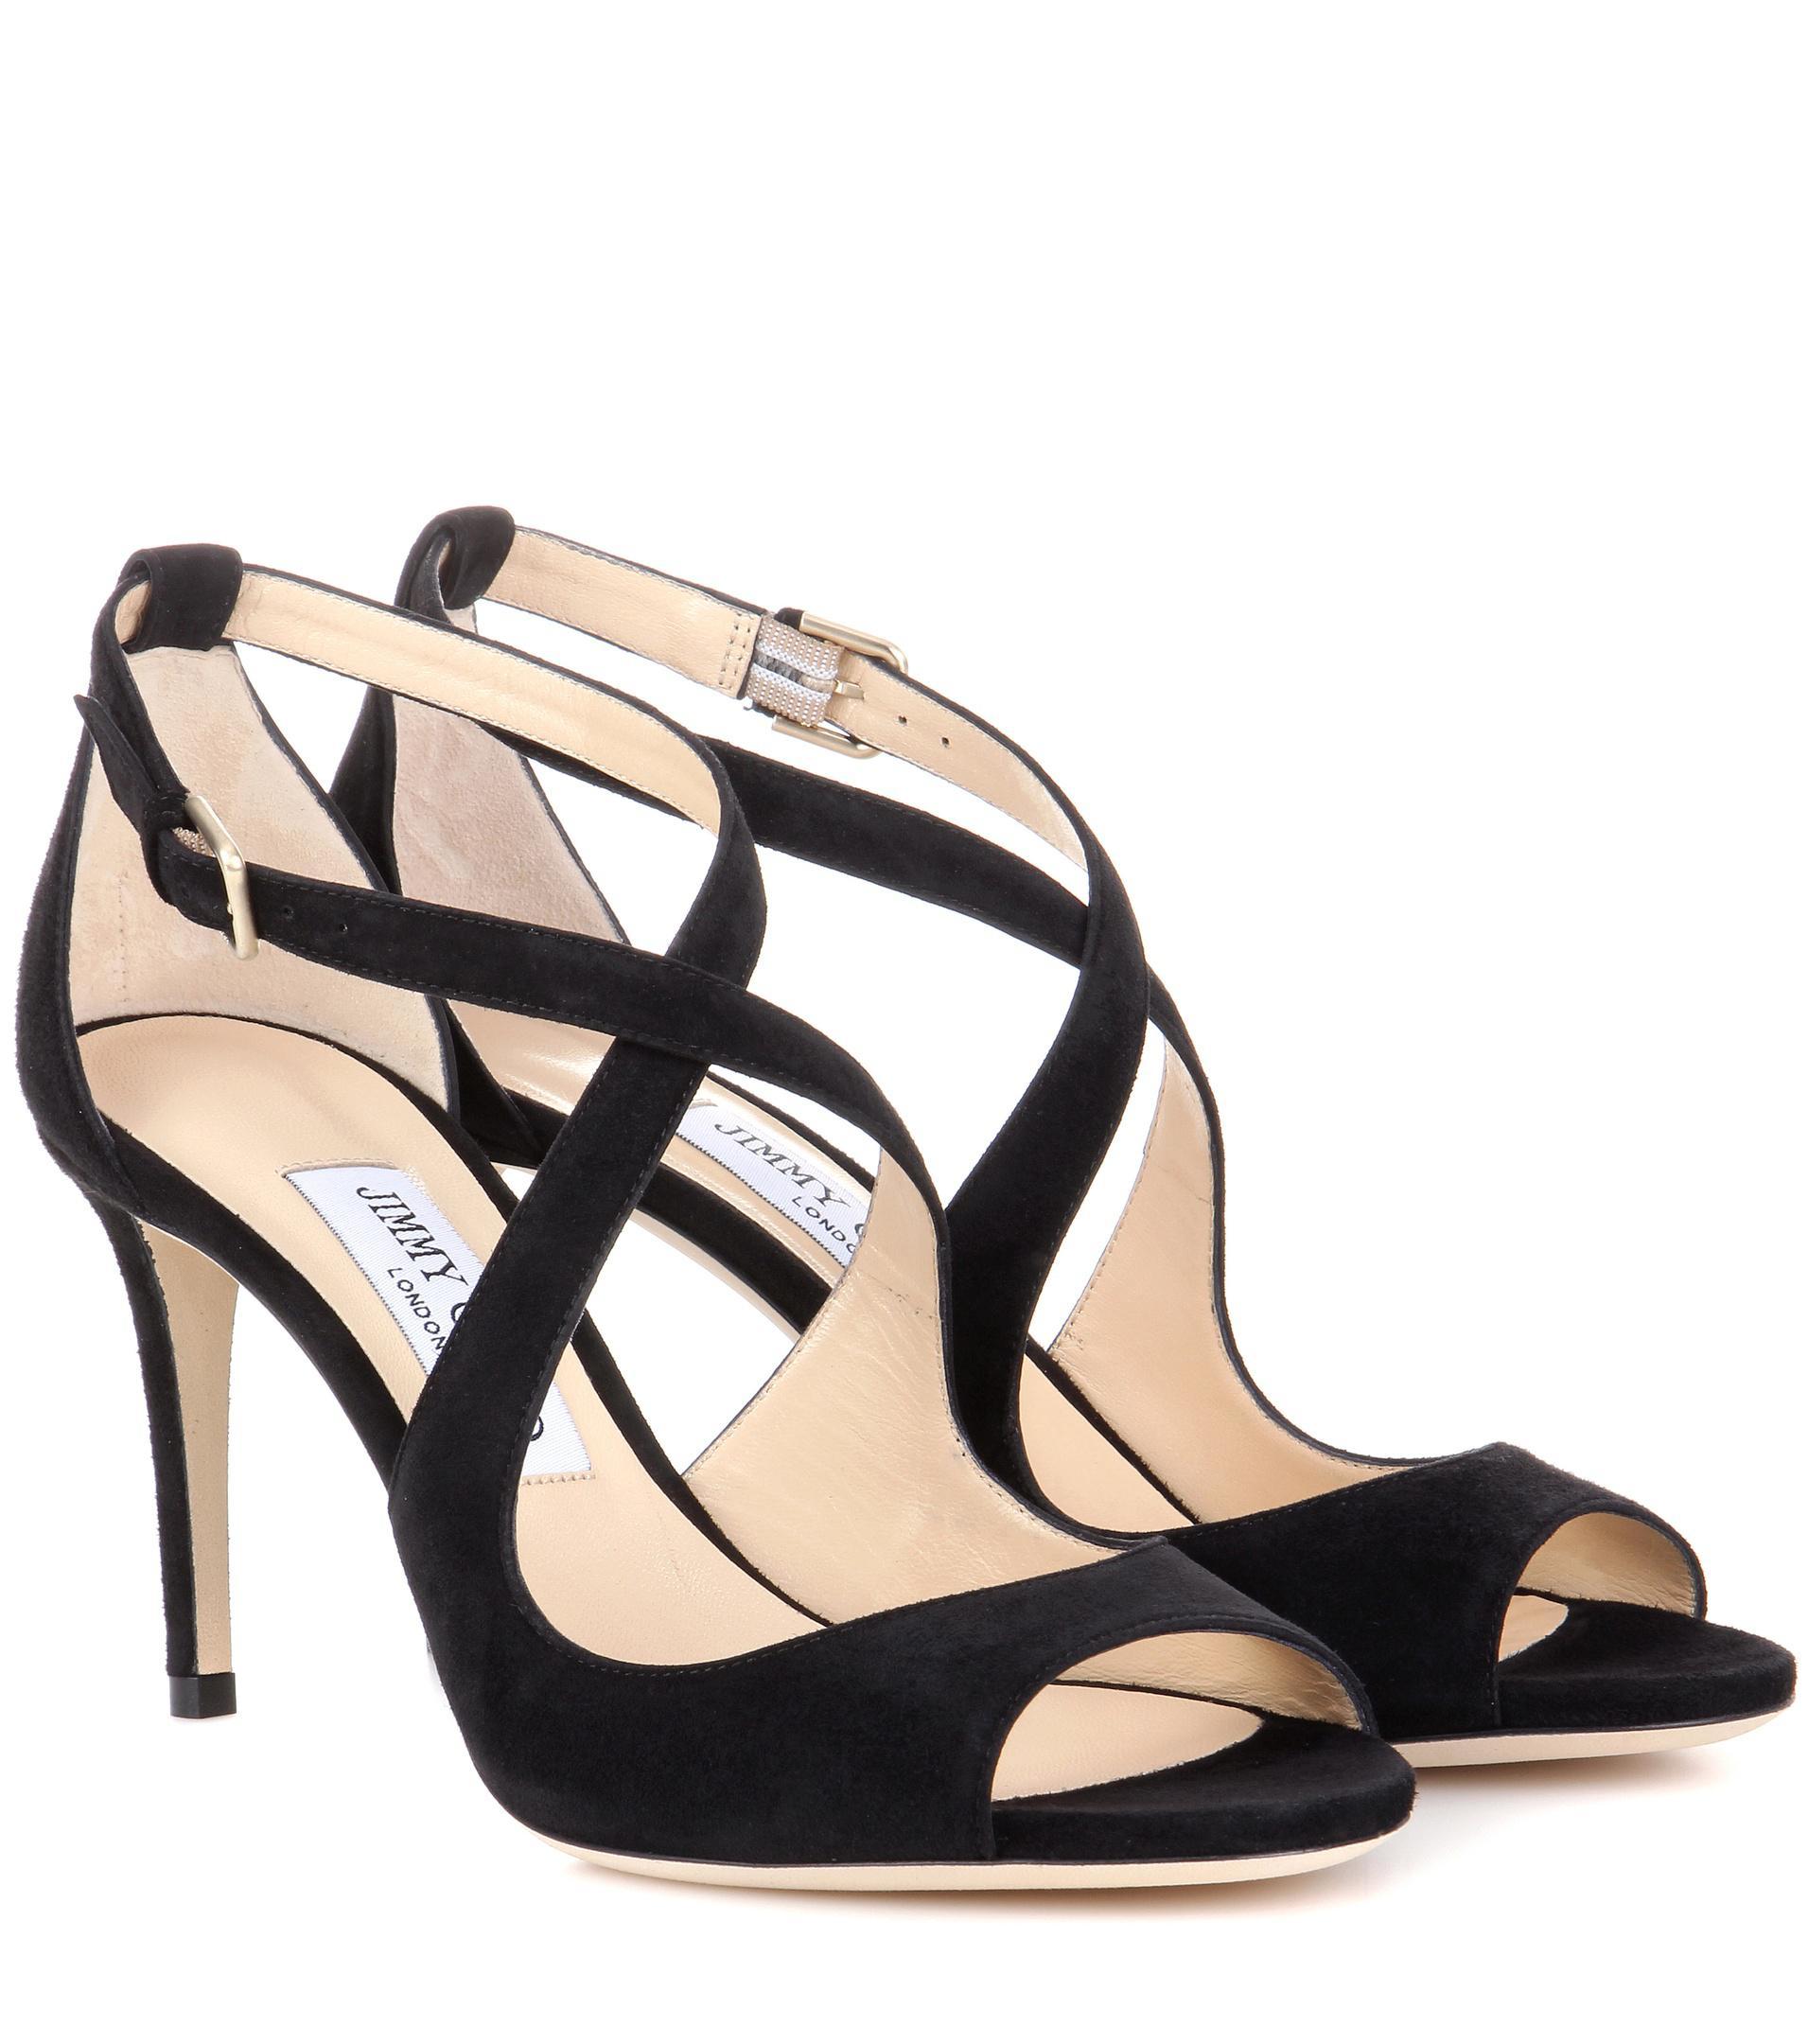 Jimmy choo Emily high heeled sandals BZV0BOzge